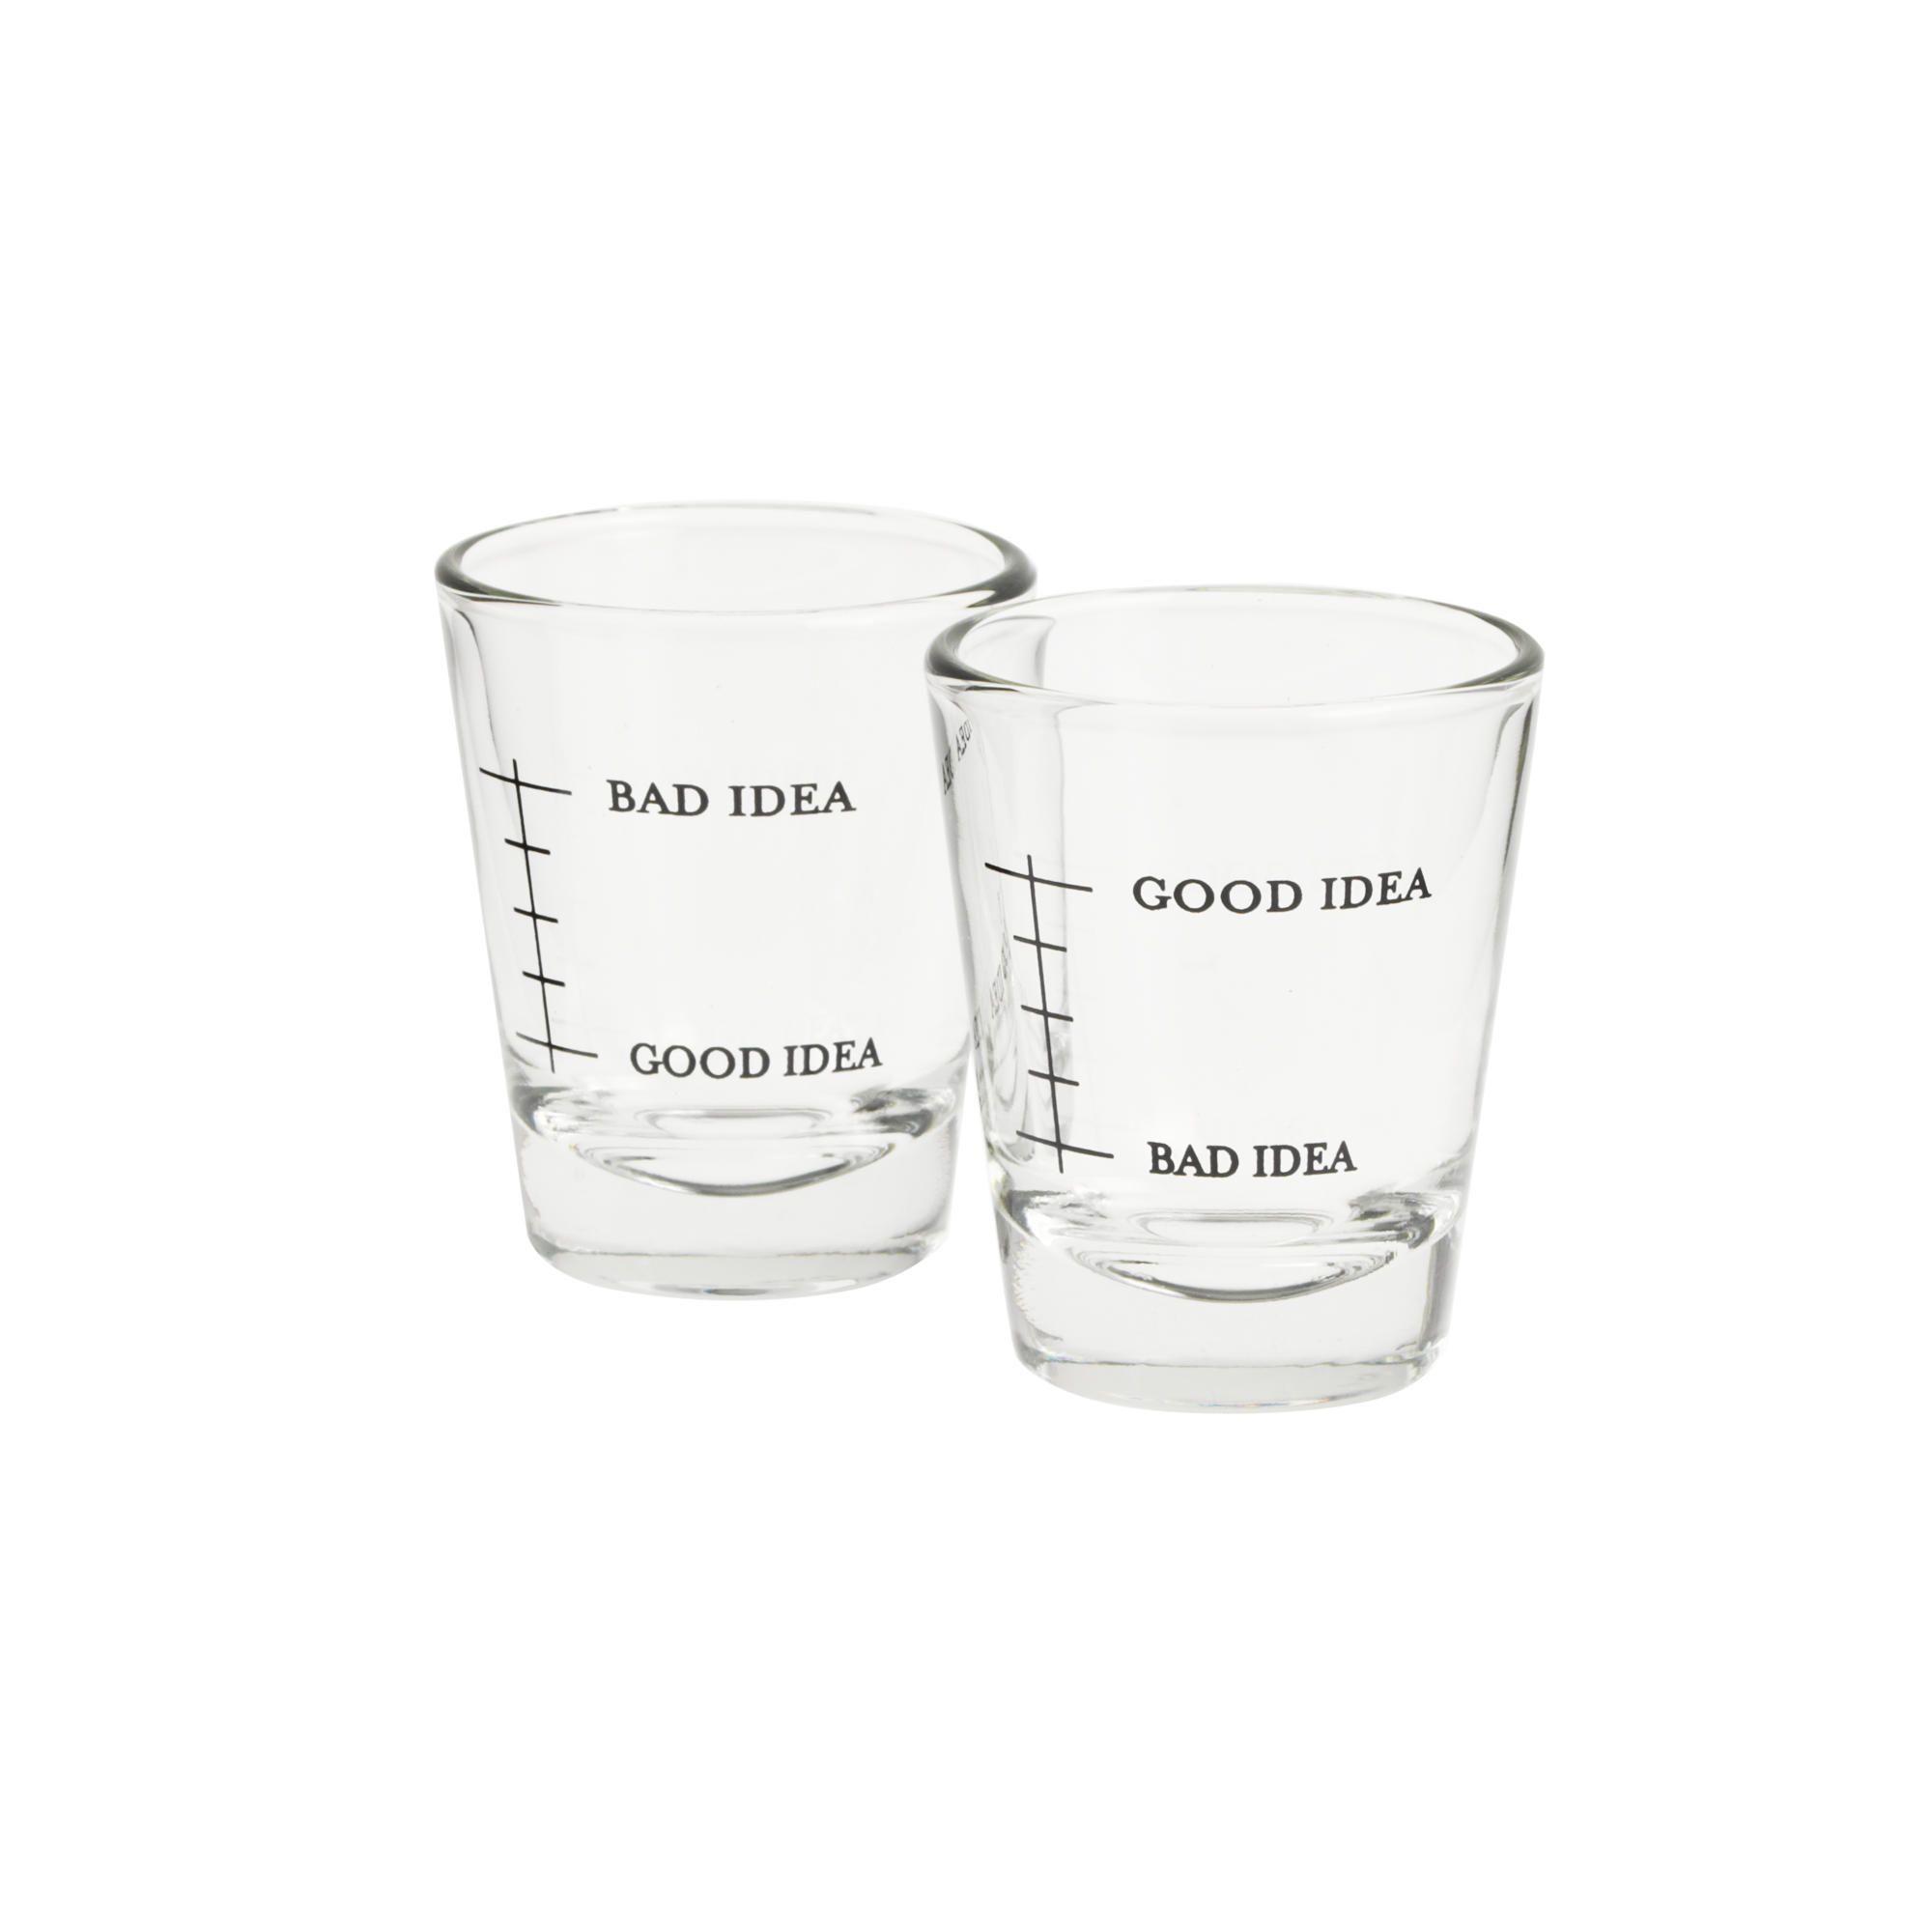 Jcrew Shot Glasses Set Editions Good Idea Bad Idea Shot Glasses Item B7930 28 Shot Glasses Funny Shot Glasses Fancy Shot Glasses